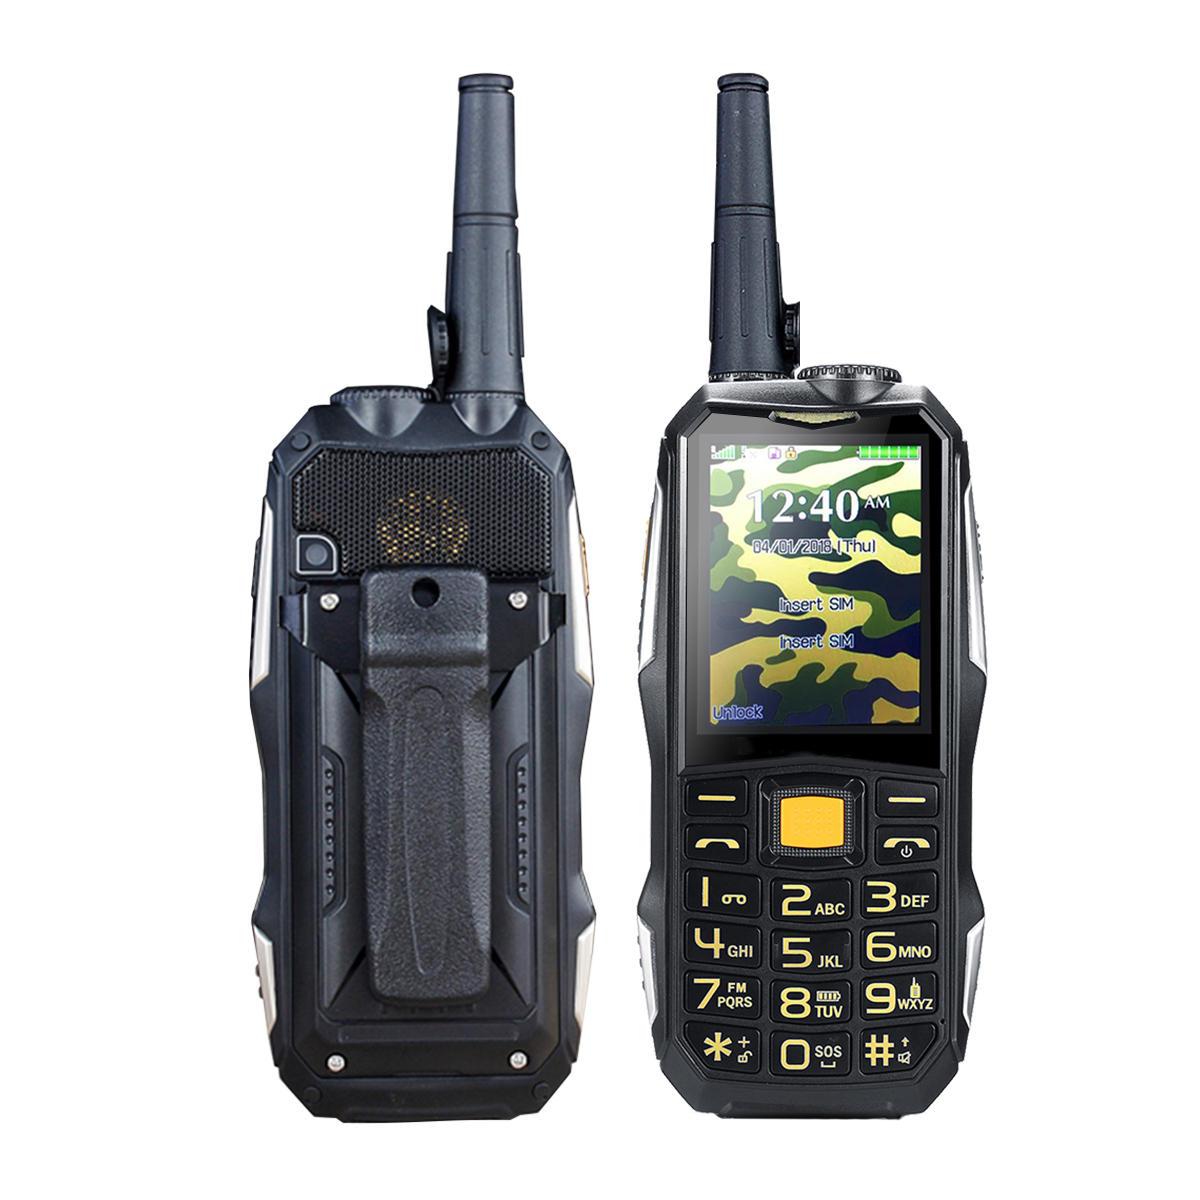 2 4inch 19800mah Rugged Phone Dual SIM GSM Walkie Talkie Standby for  Smartphone FM Radio